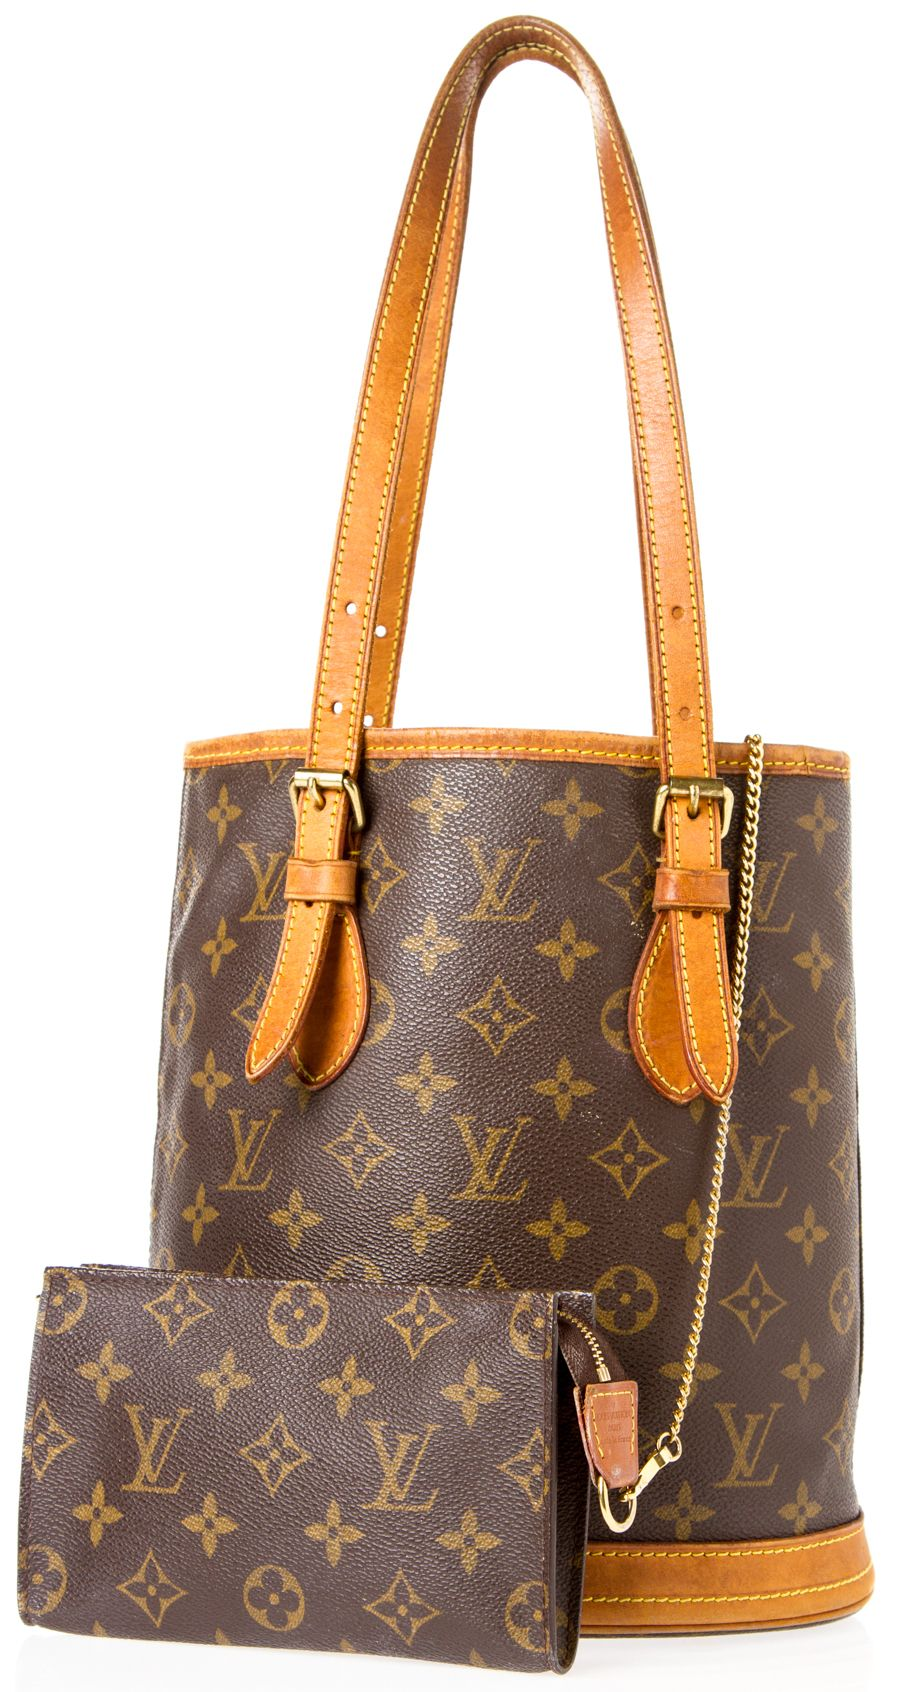 43182524b Louis Vuitton Tote | louis vuitton | Fashion Faves | Bolsas de grife ...